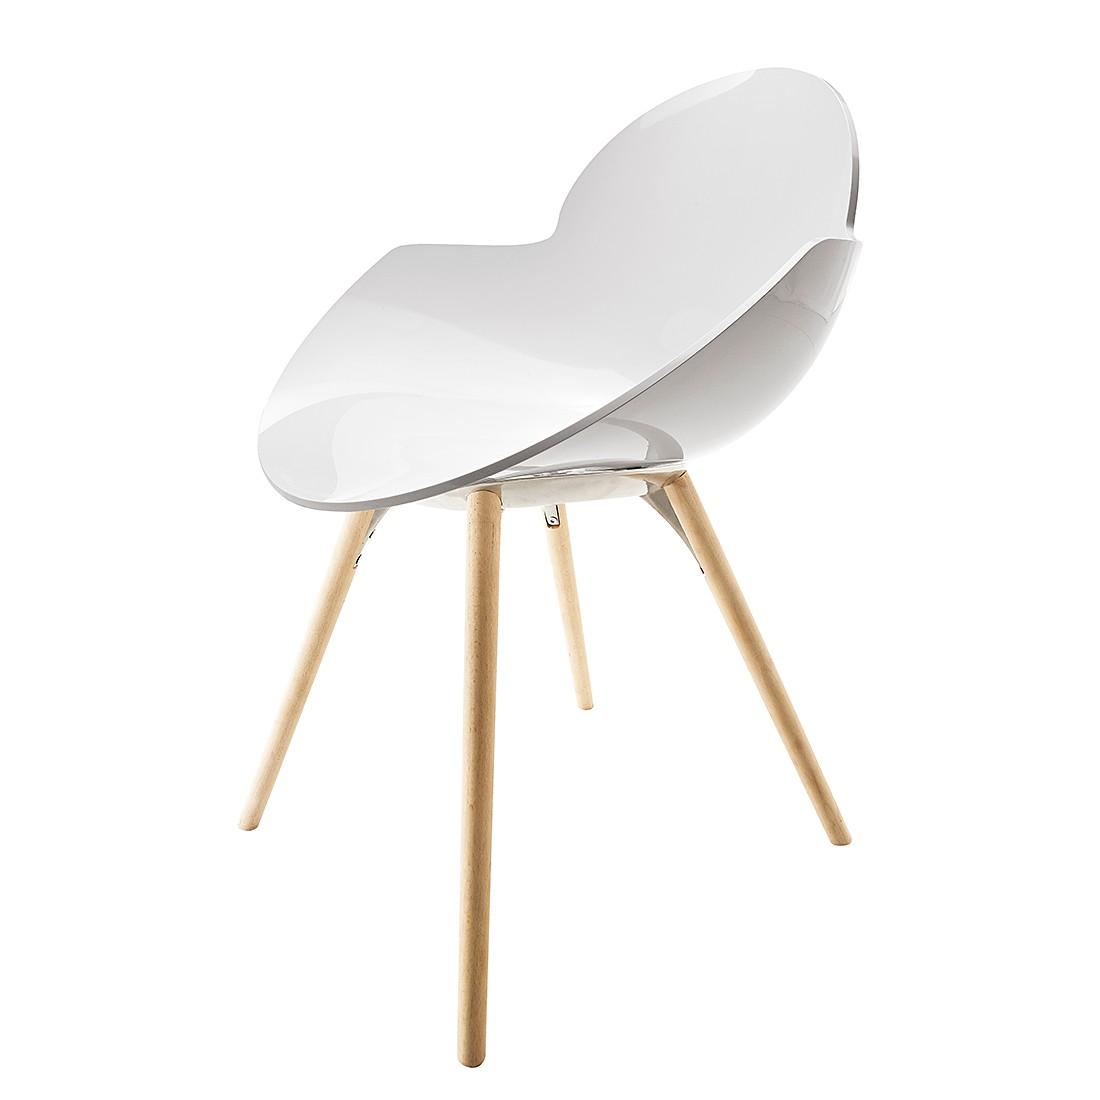 schalenstuhl bucket 2er set metall schwarz bepure online kaufen. Black Bedroom Furniture Sets. Home Design Ideas